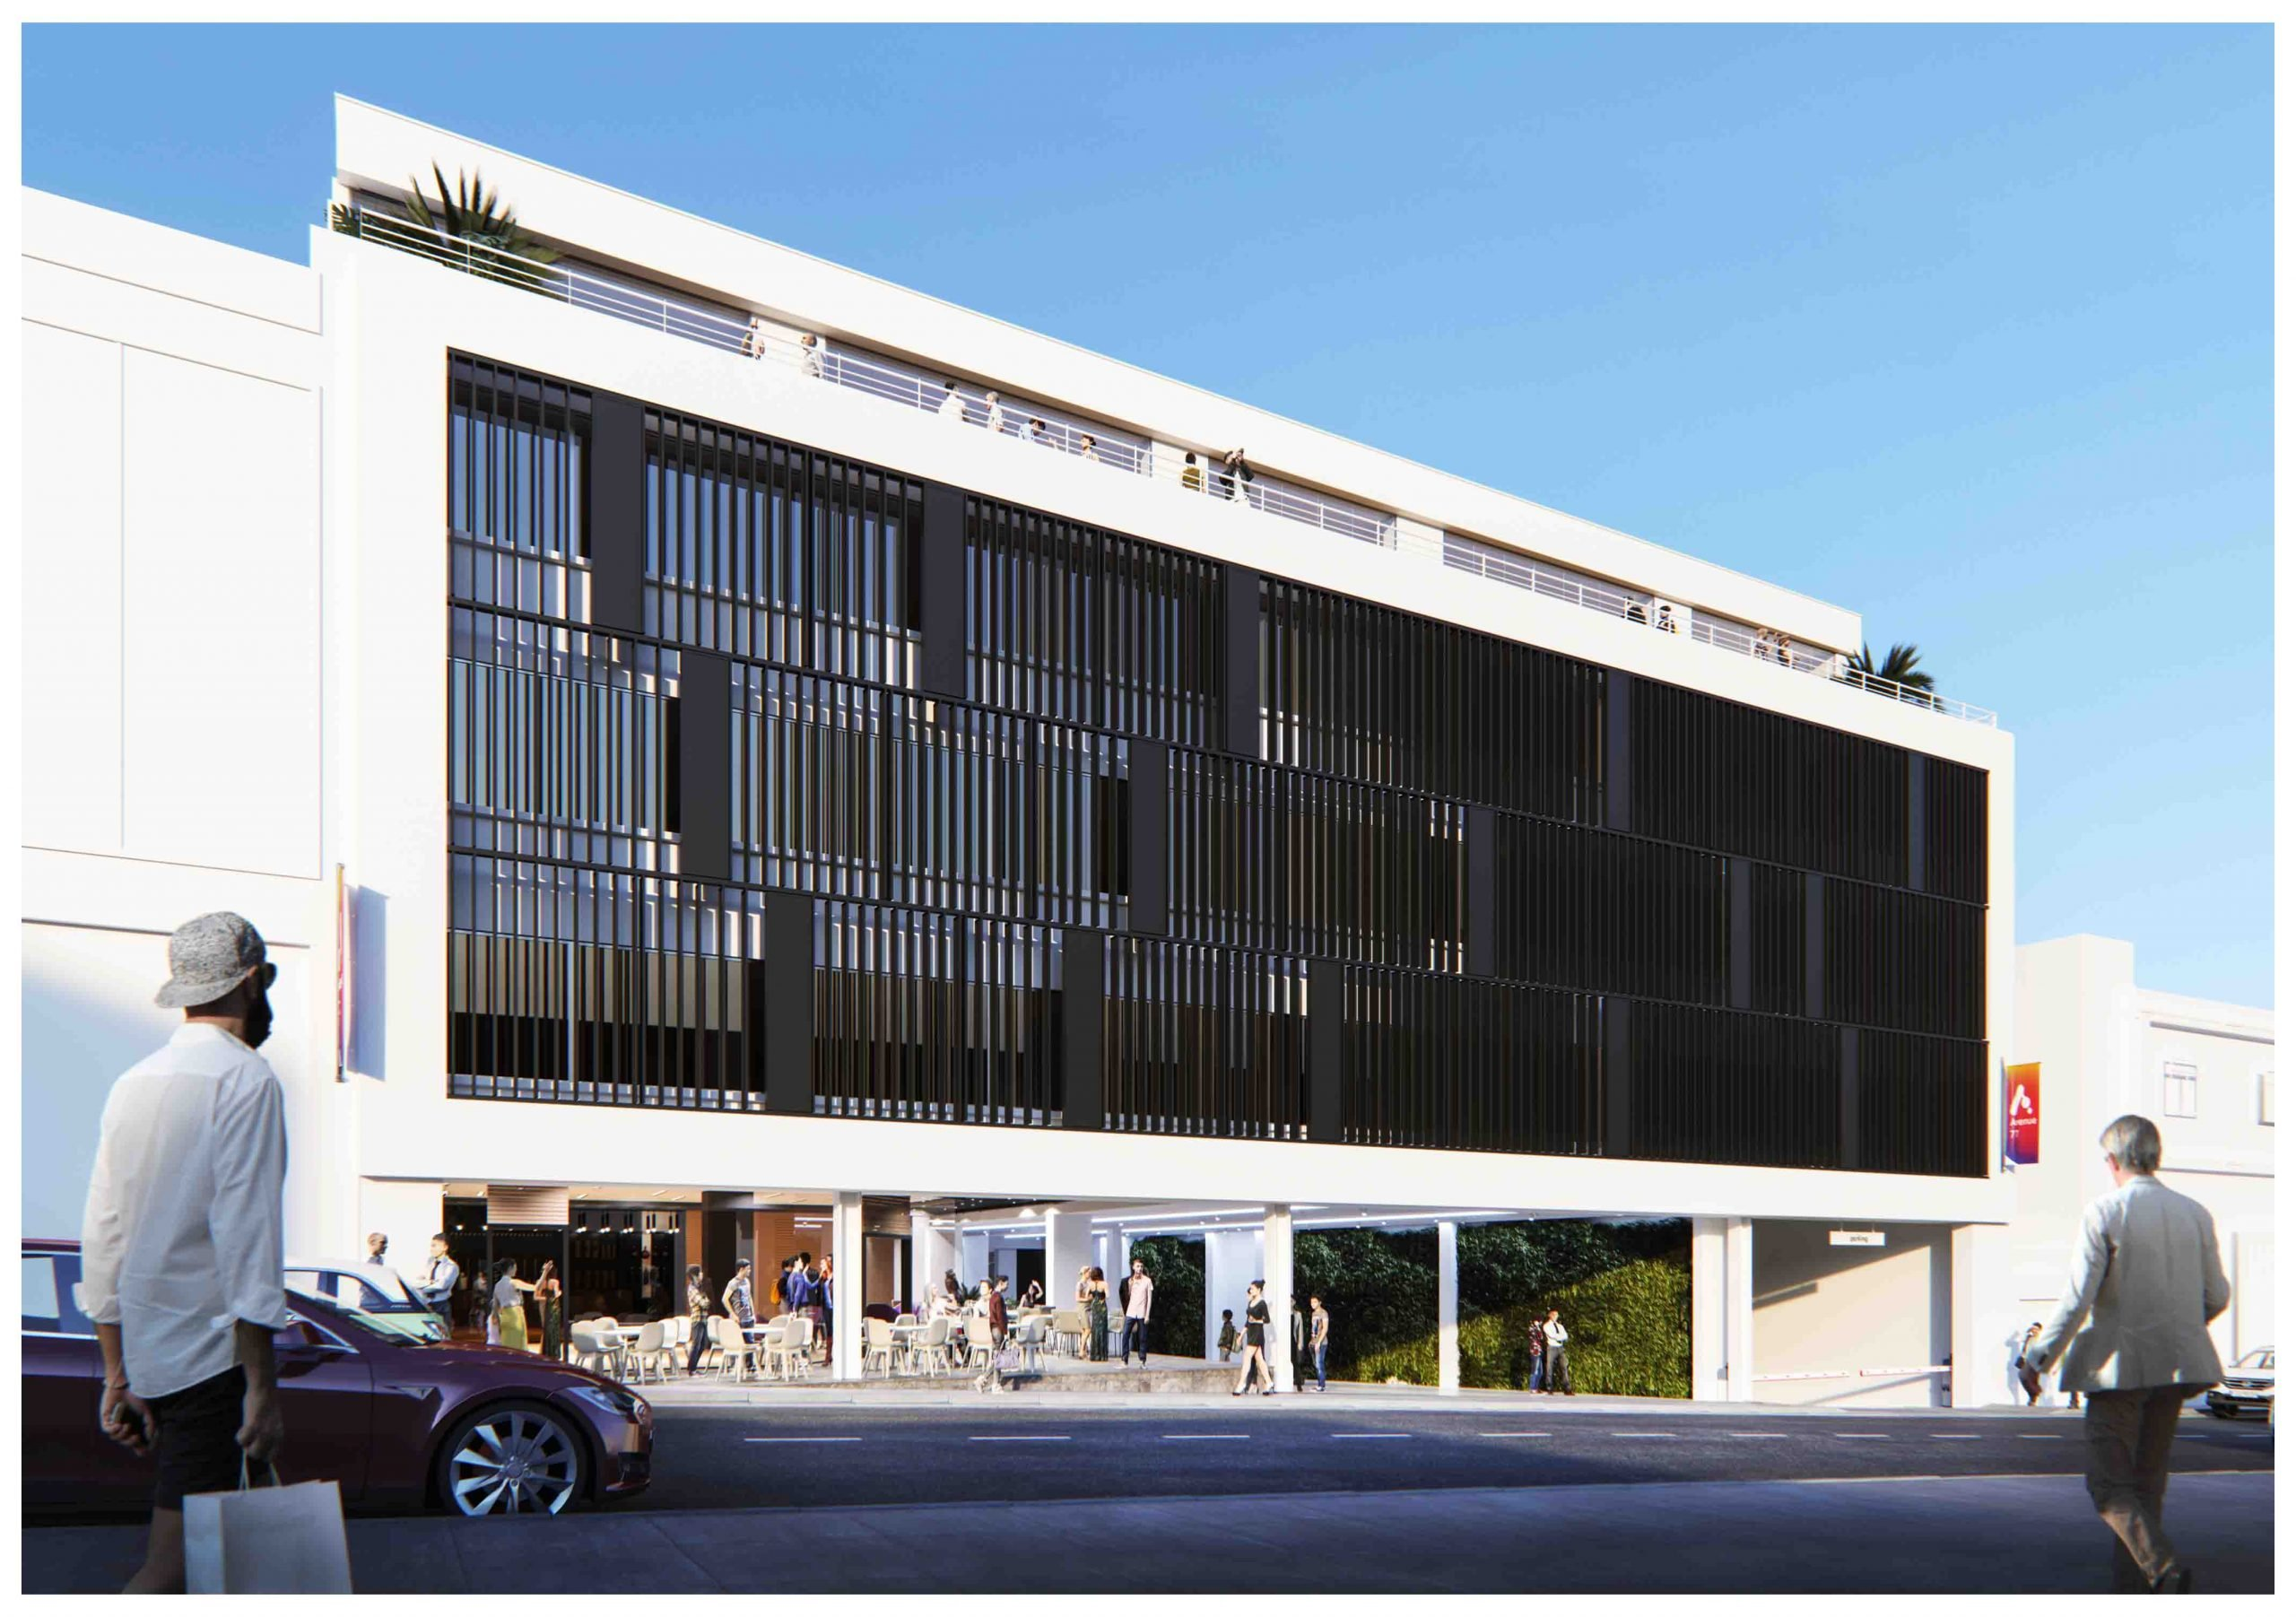 https://dprostudio.com/wp-content/uploads/2021/01/exterior-render-side-angle-avenue-77-dprostudio-scaled.jpg